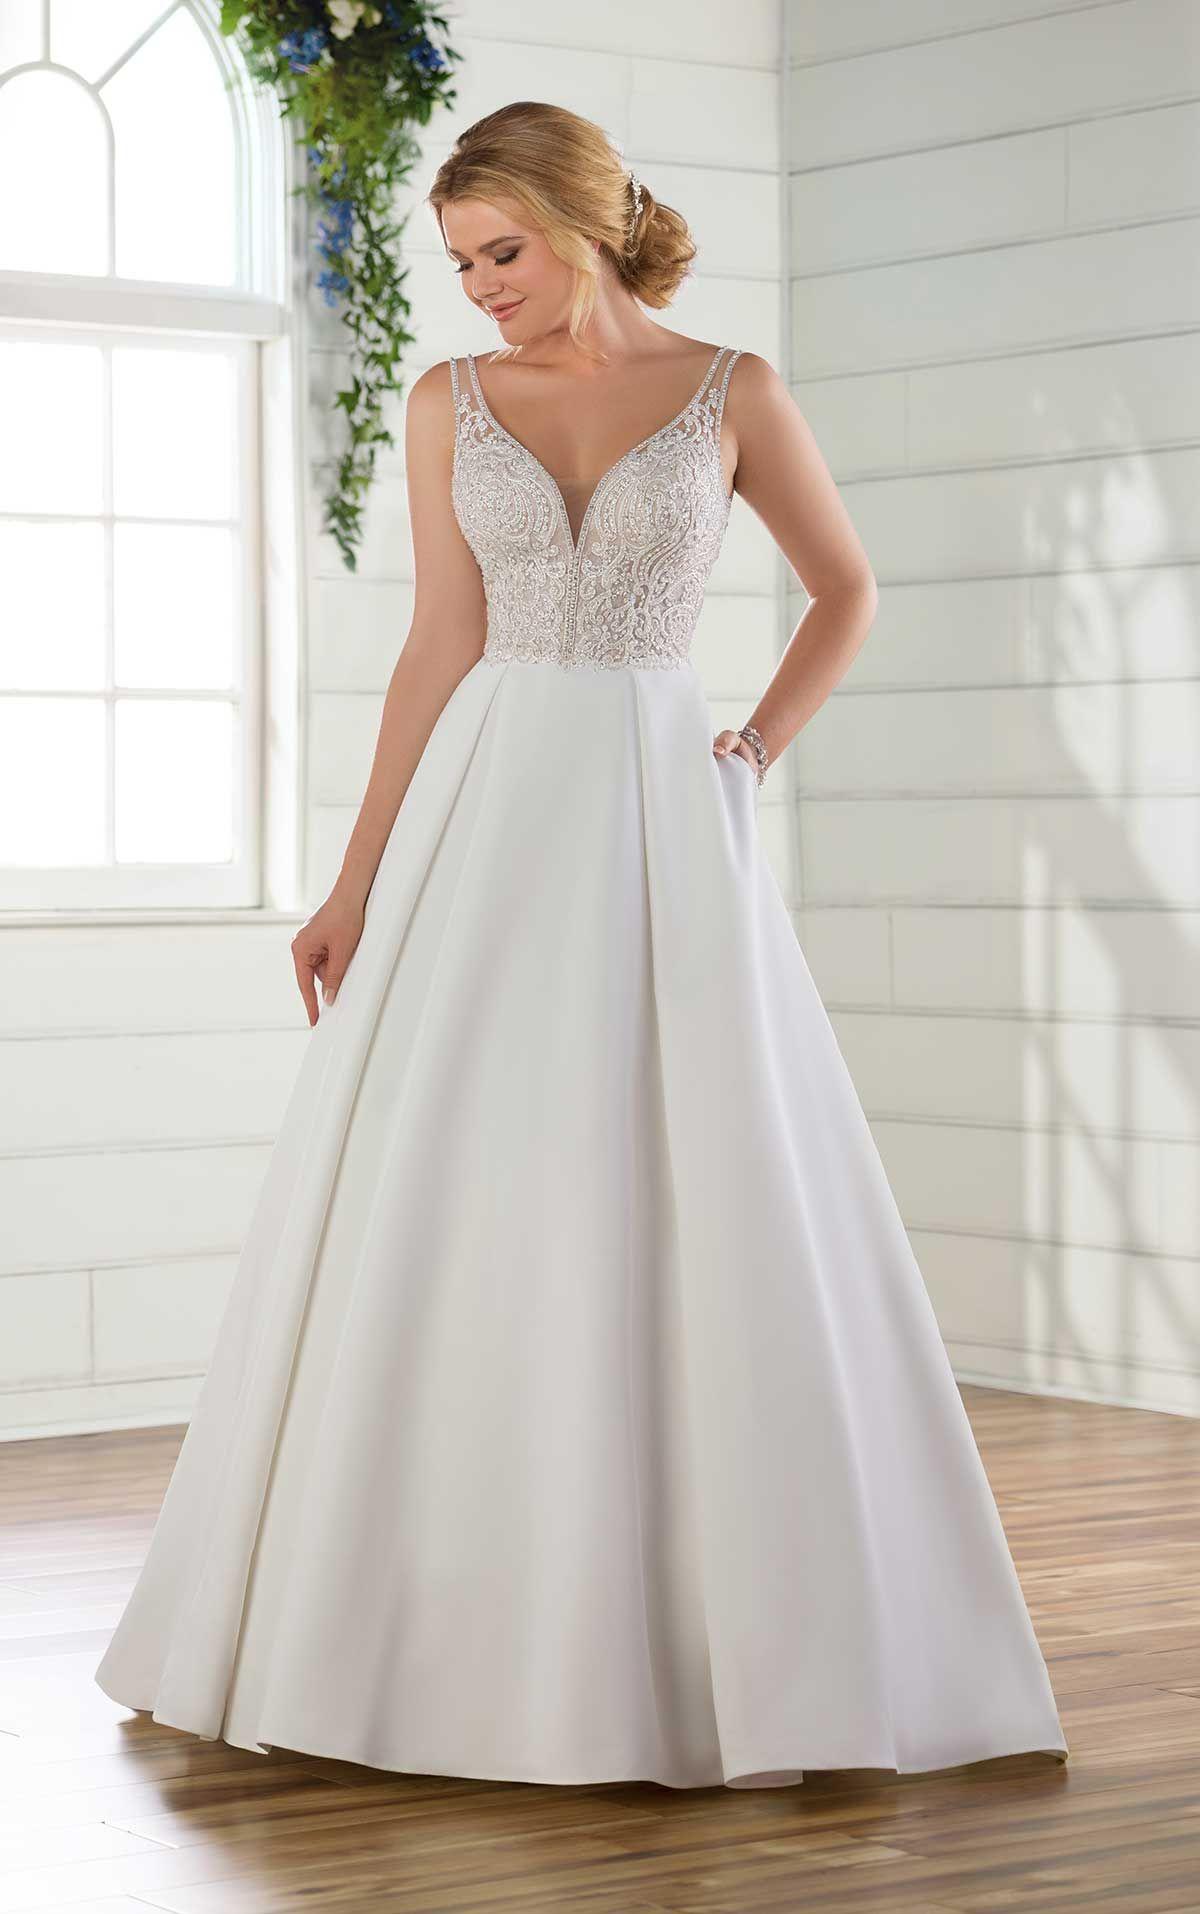 45547f00f884e Essense of Australia D2627- Find gown @ De Ma Fille Bridal in Ft. Worth,  TX. 817.921.2964, www.demafille.com